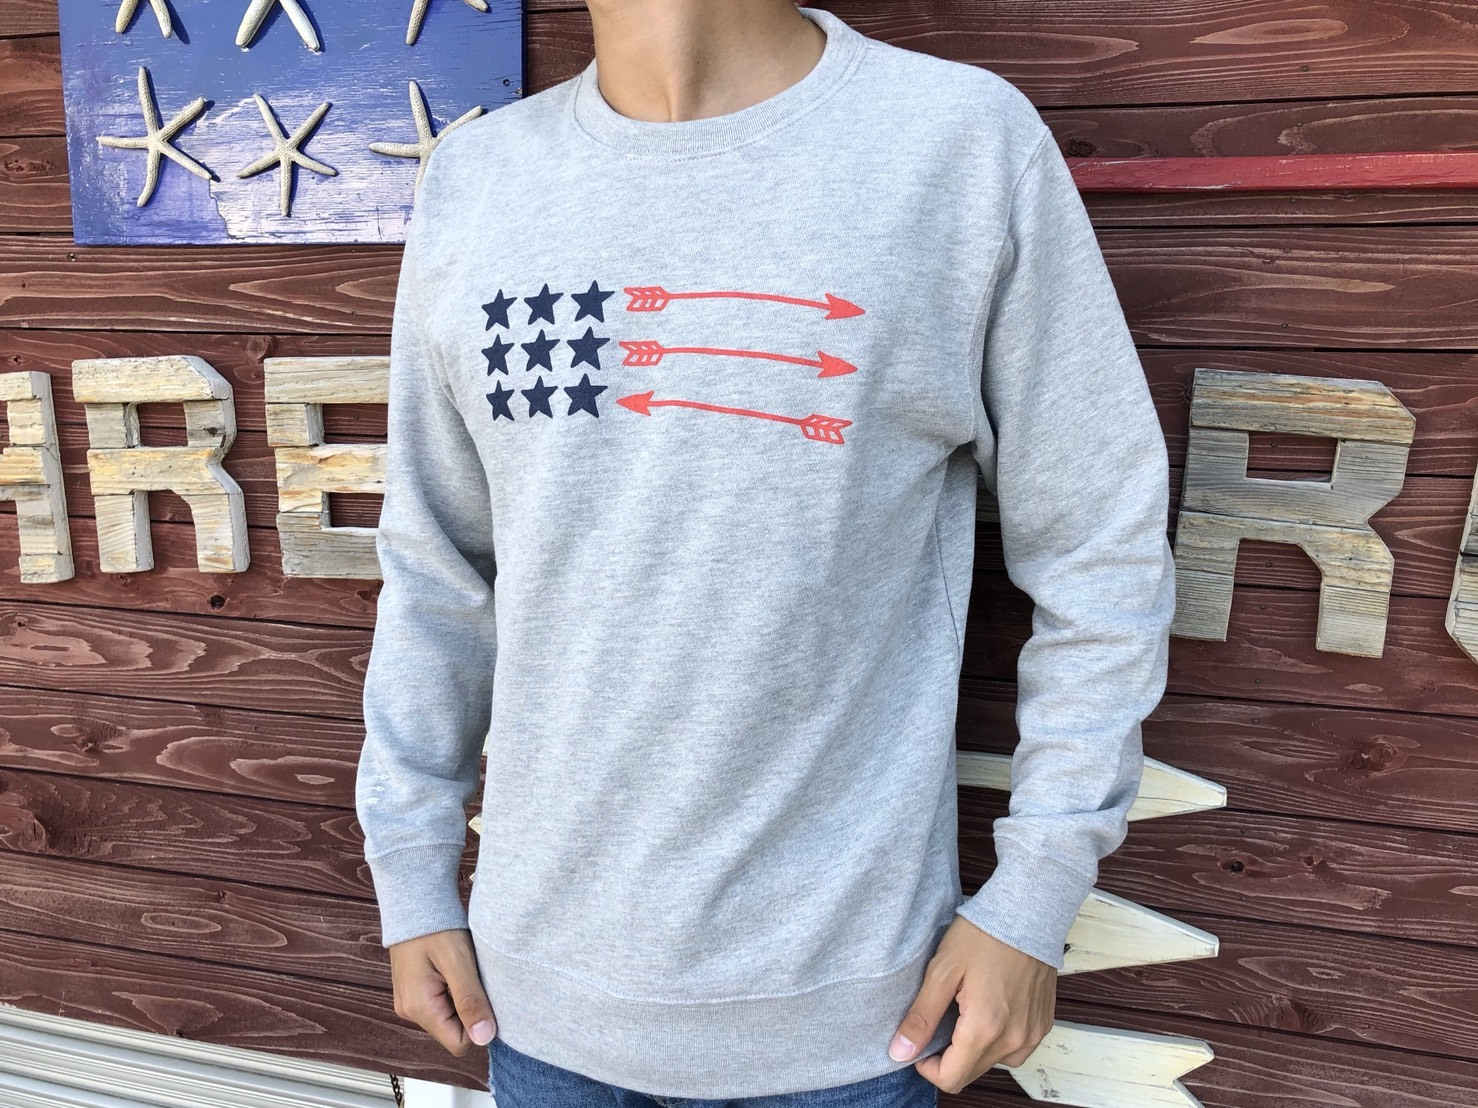 USA ArrowFlag スウェット(grey)